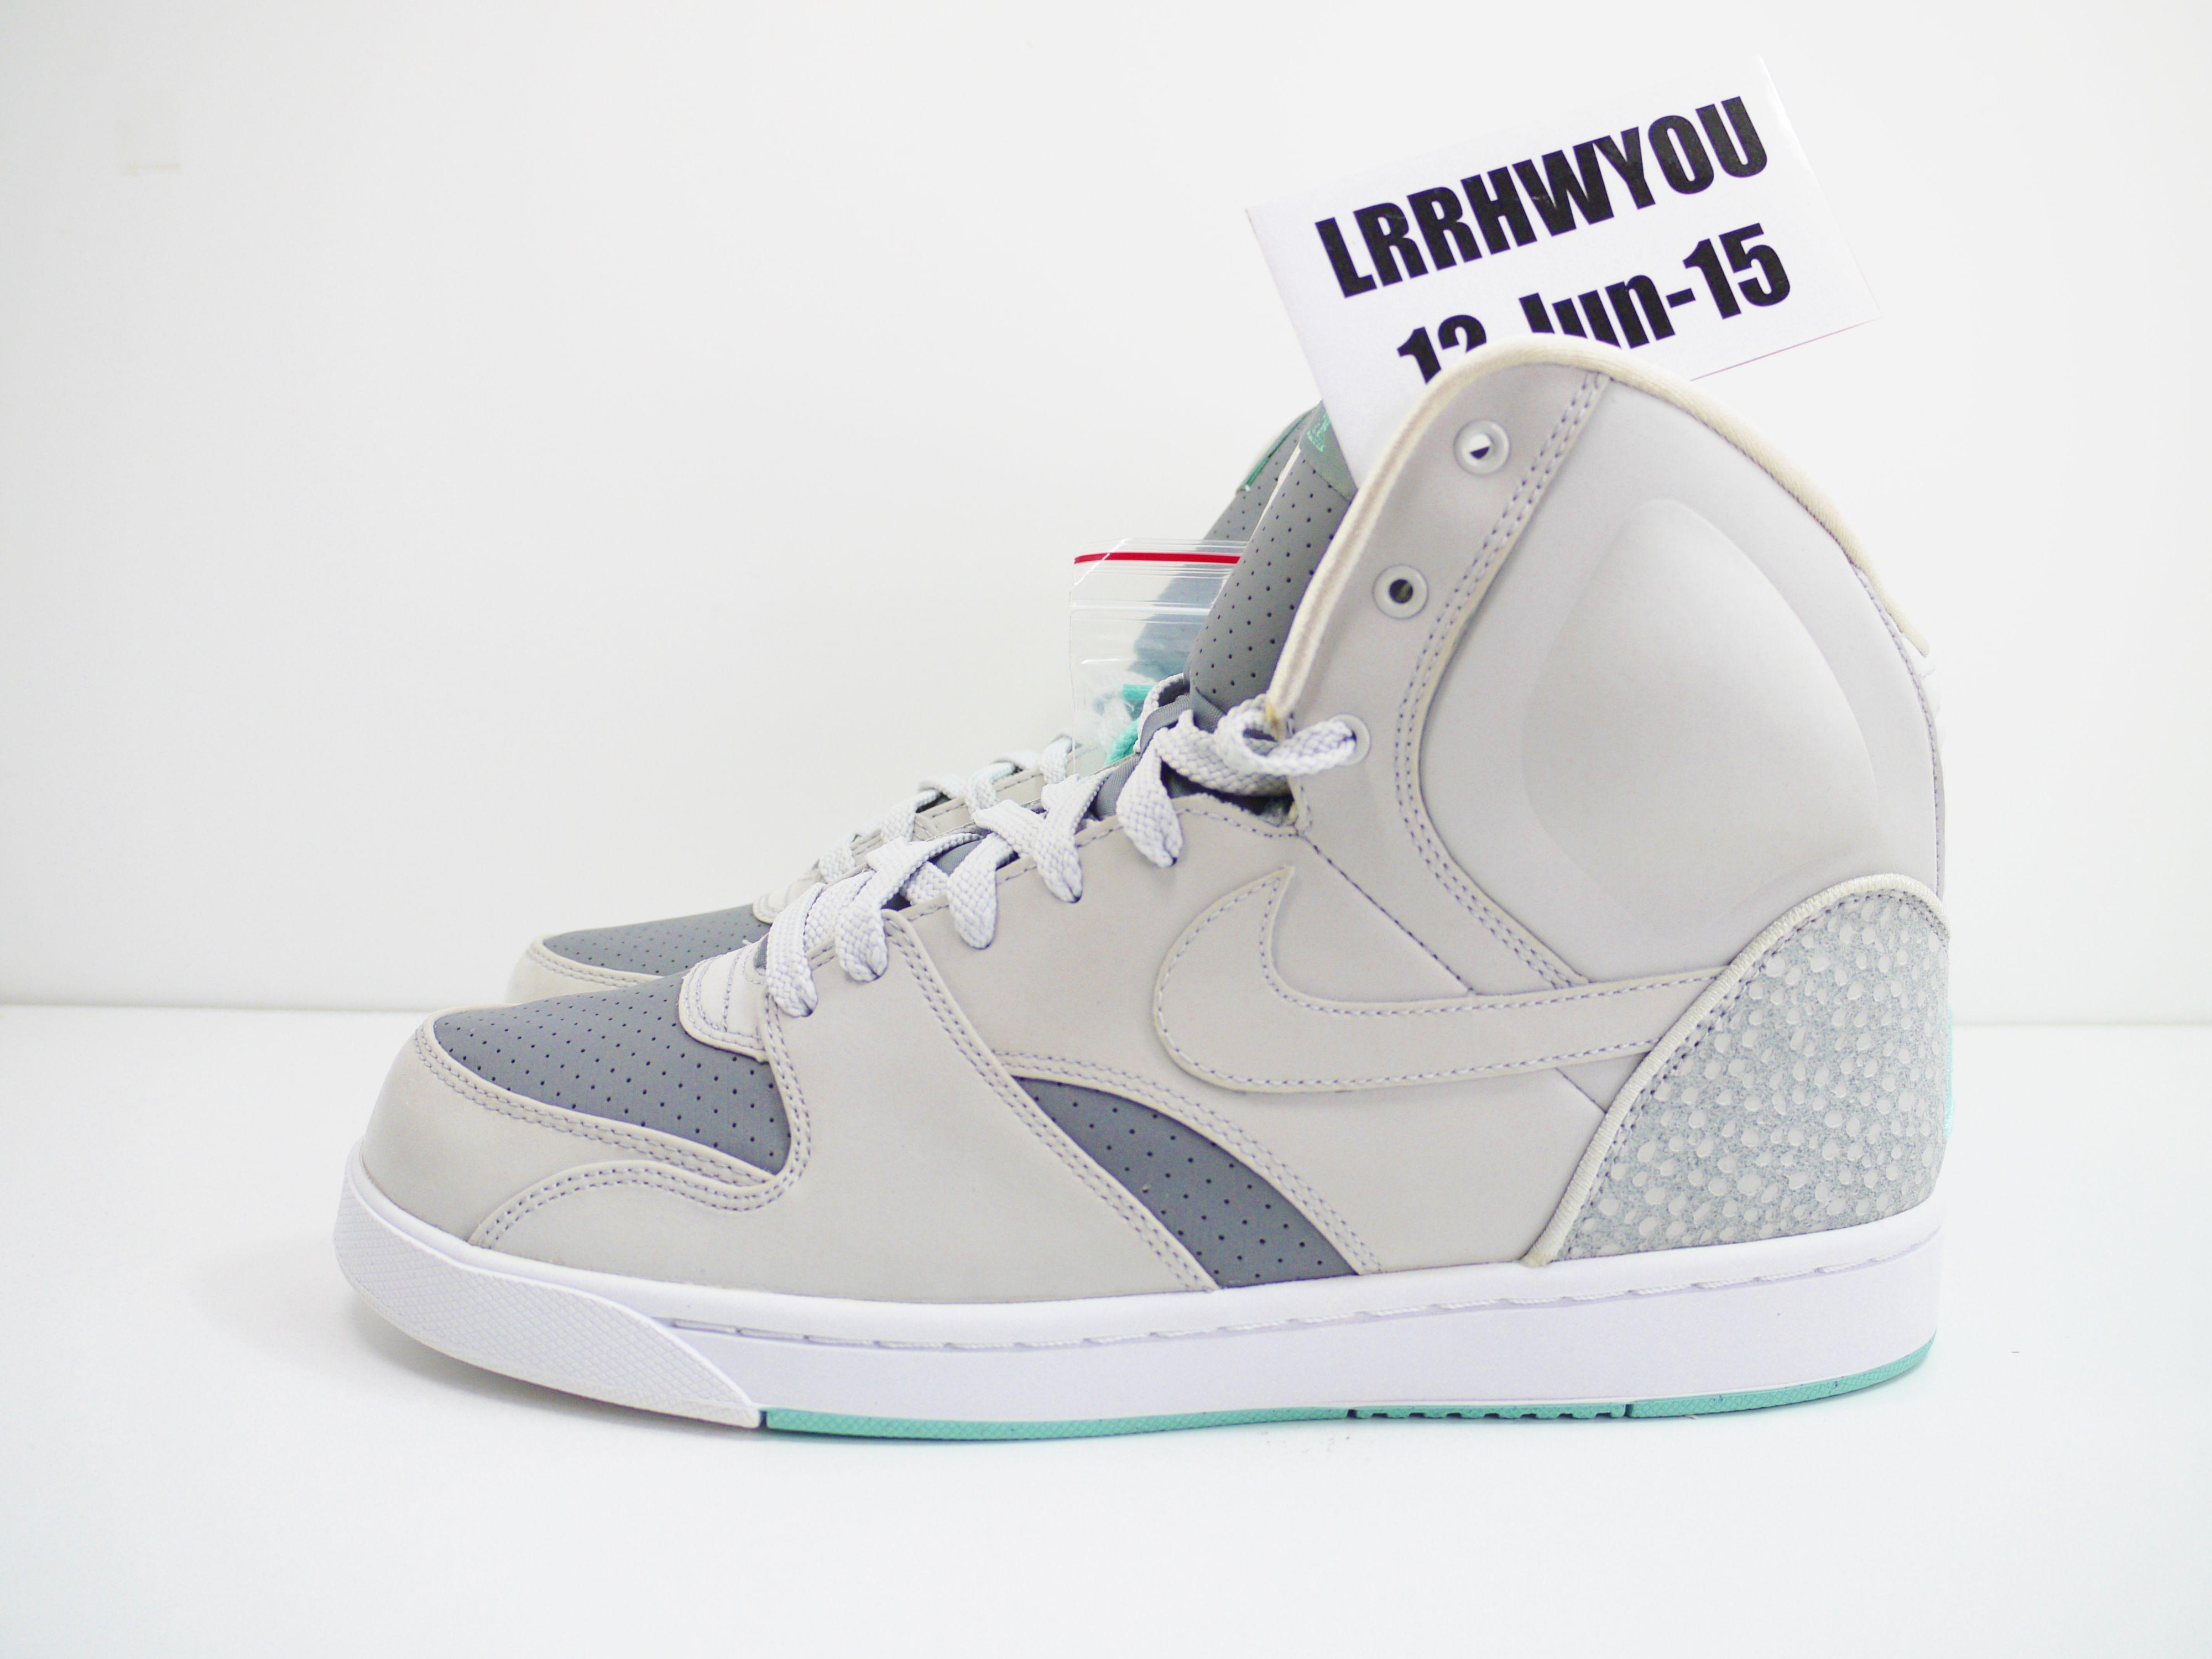 766f414e888 Nike RT1 High 354034 002 Size 9 neutral grey   neutral grey   green mist    cl g